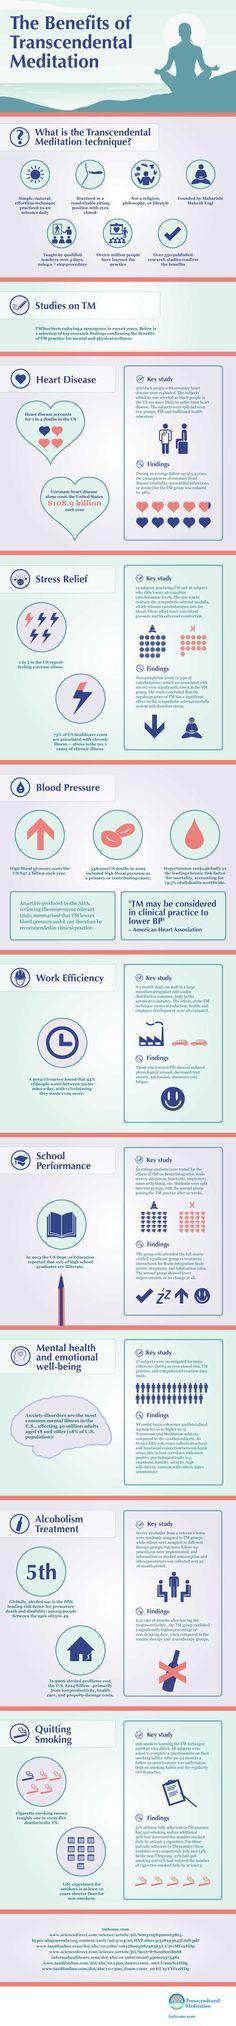 The Benefits of Transcendental Meditation Infographic